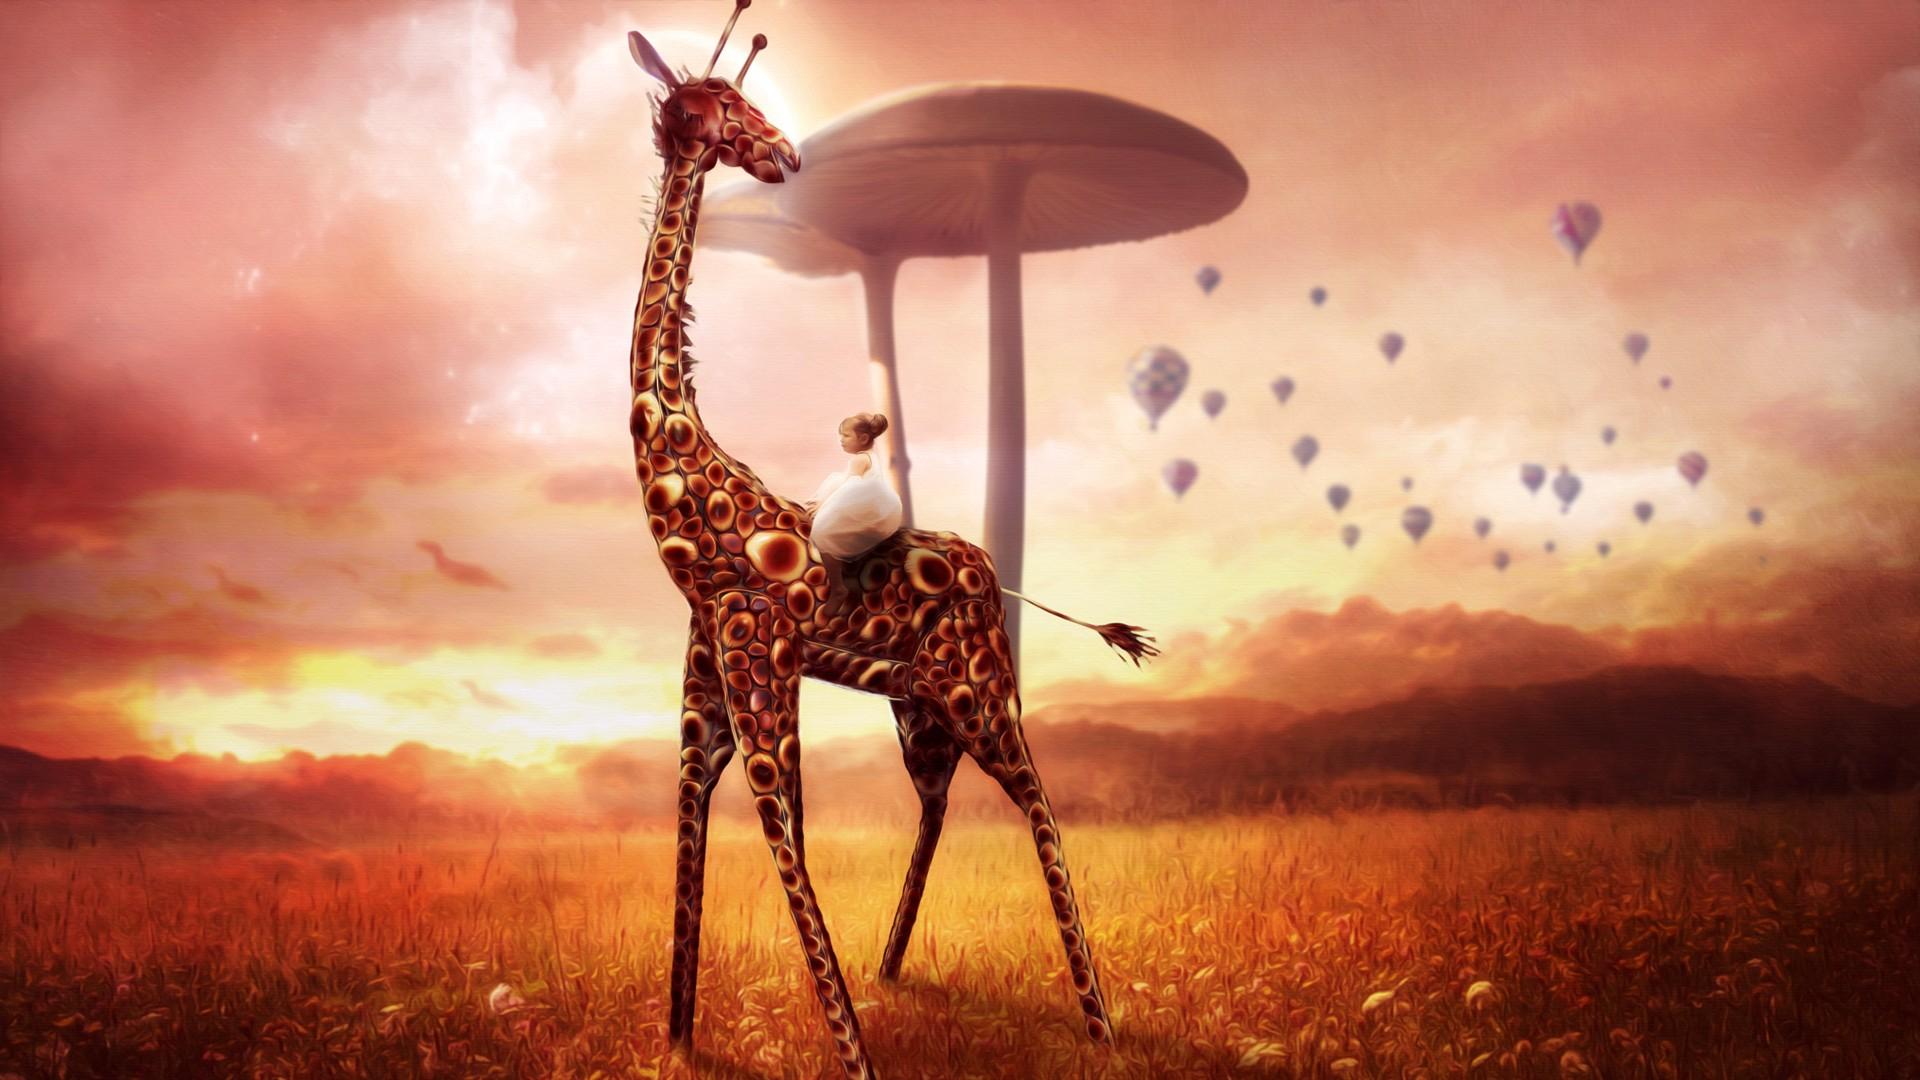 Cute Baby Ultra Hd Wallpapers Giraffe Dream Wallpapers Hd Wallpapers Id 13793